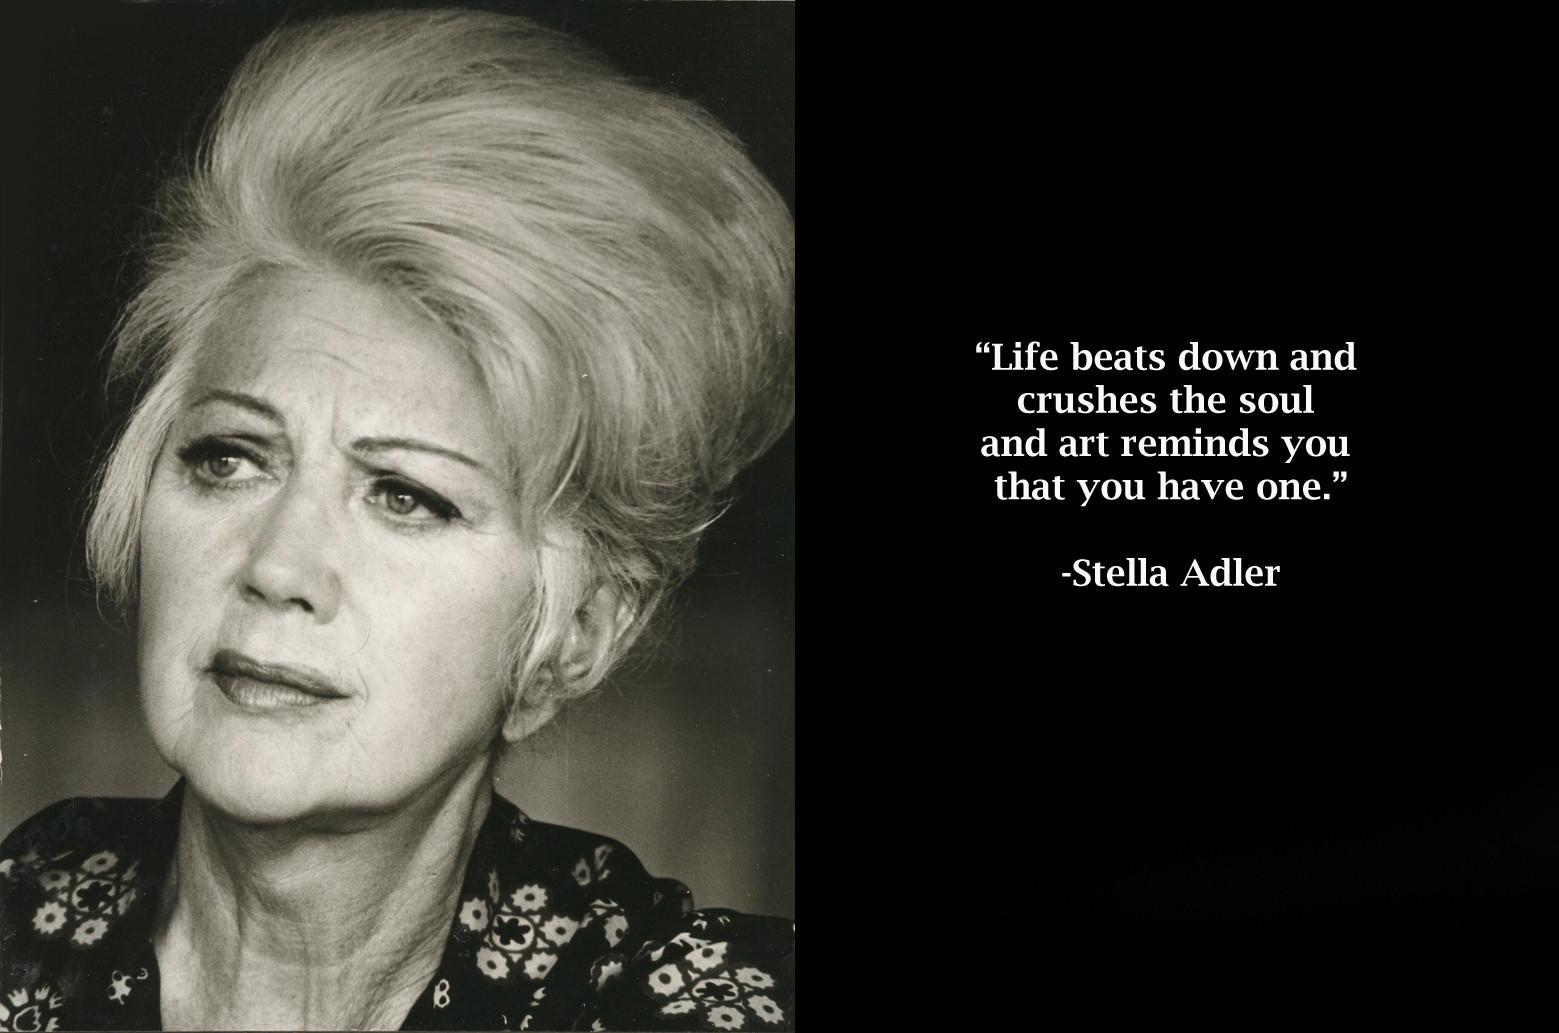 Stella Adler's quote #1